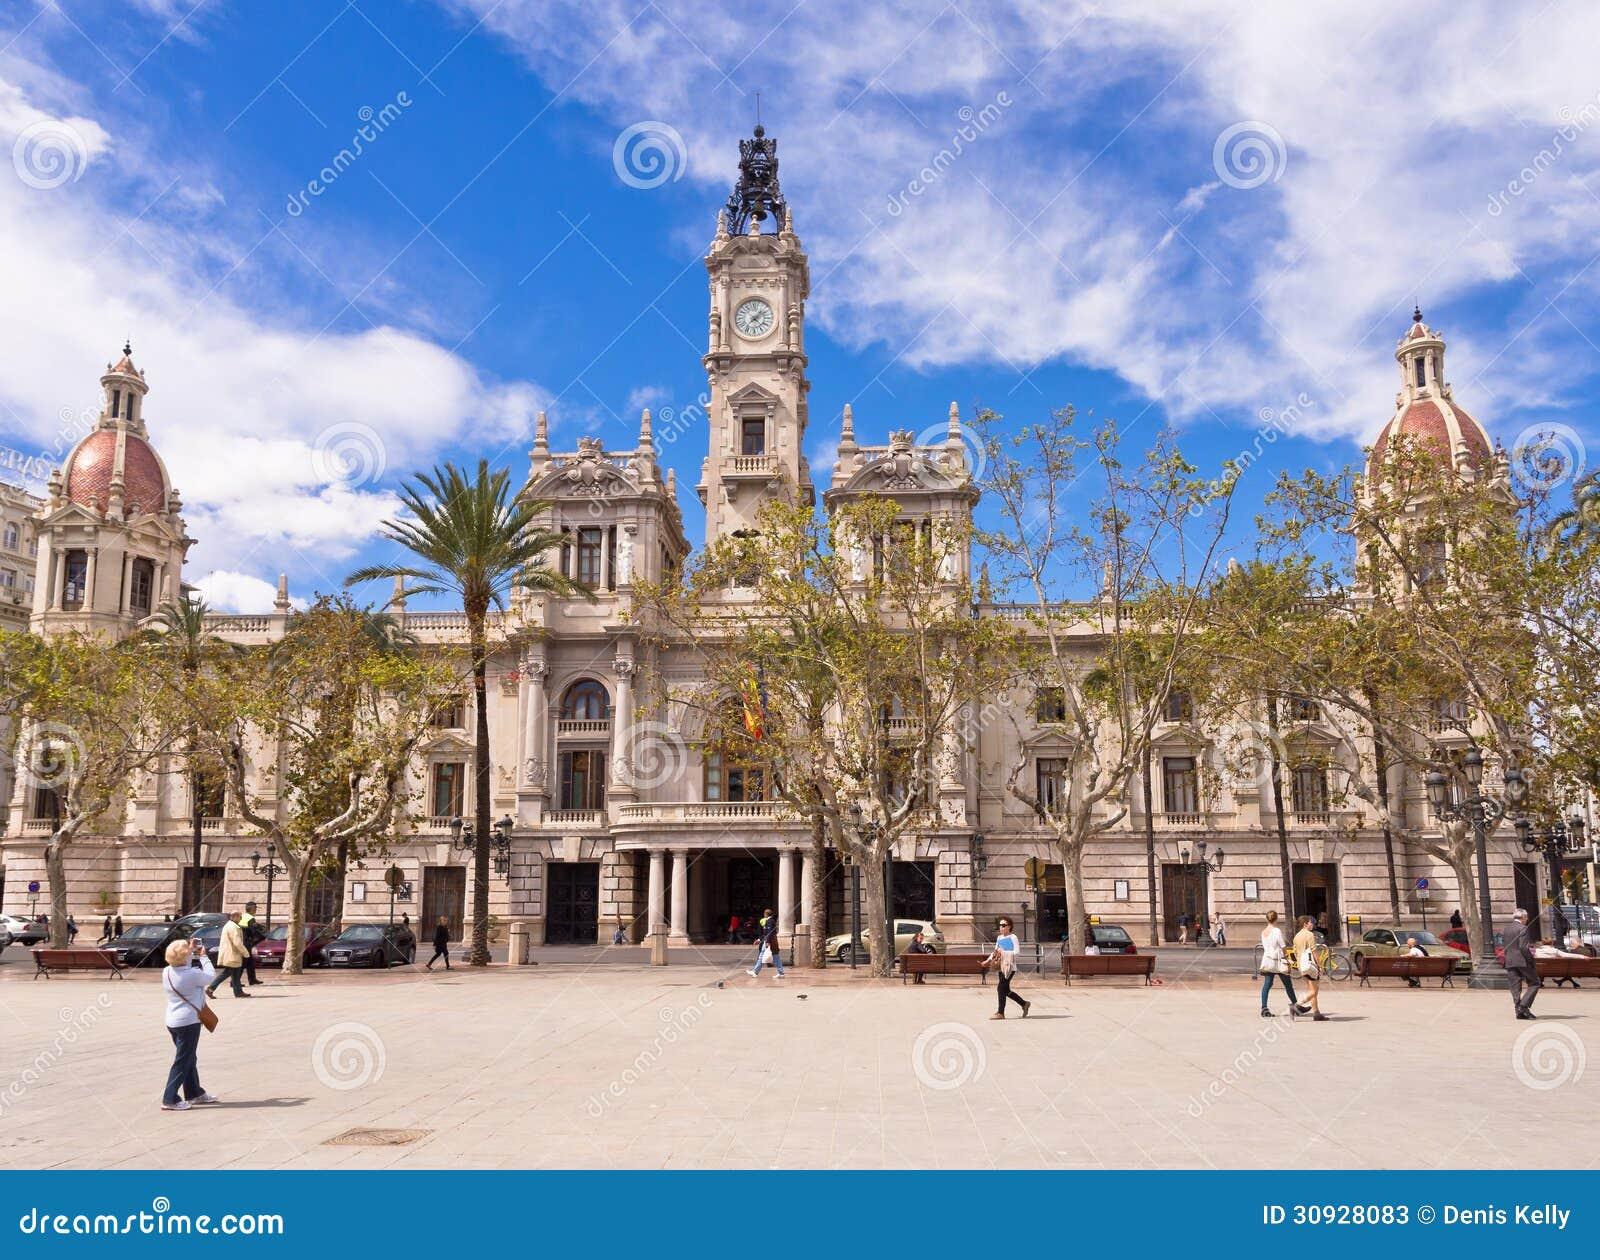 City Hall in Valencia, Spain